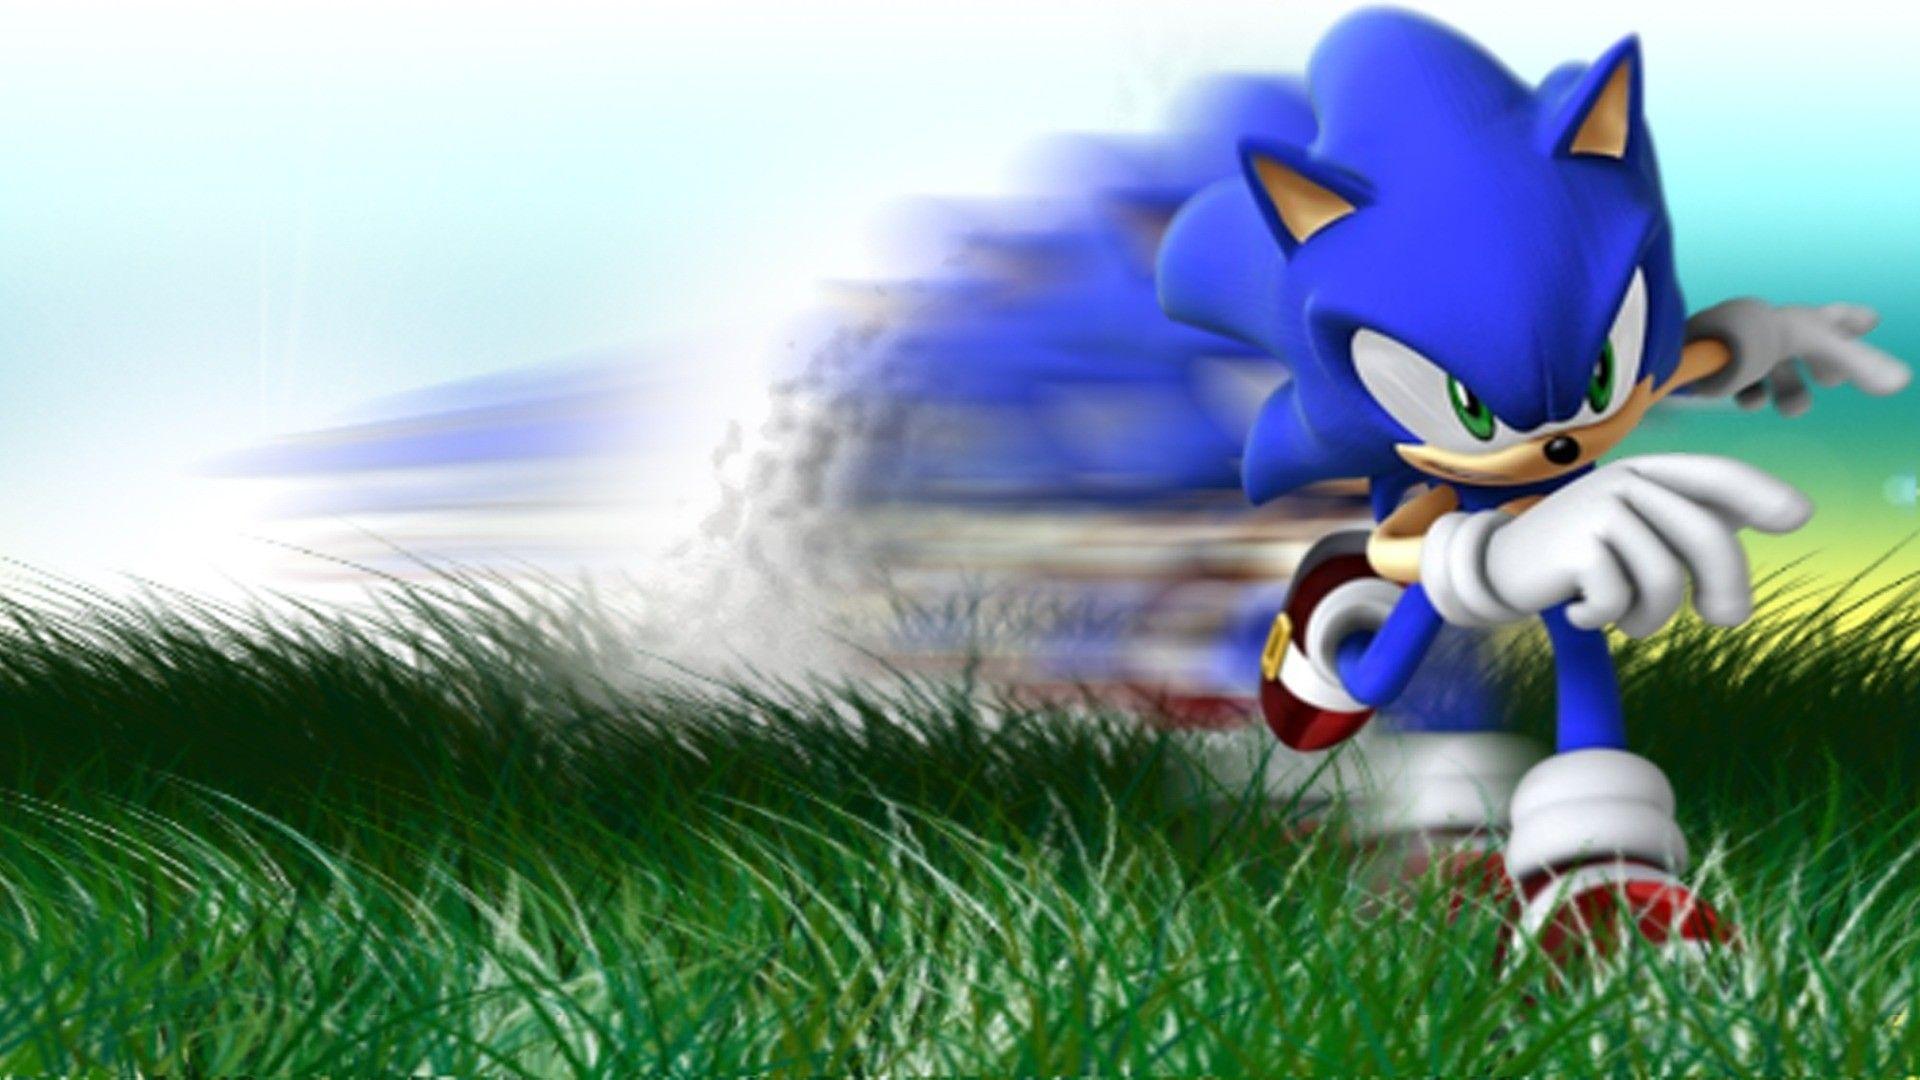 Cartoon Sonic Hd Wallpaper 6 Animated Wallpapers For Mobile Cartoon Wallpaper Cartoon